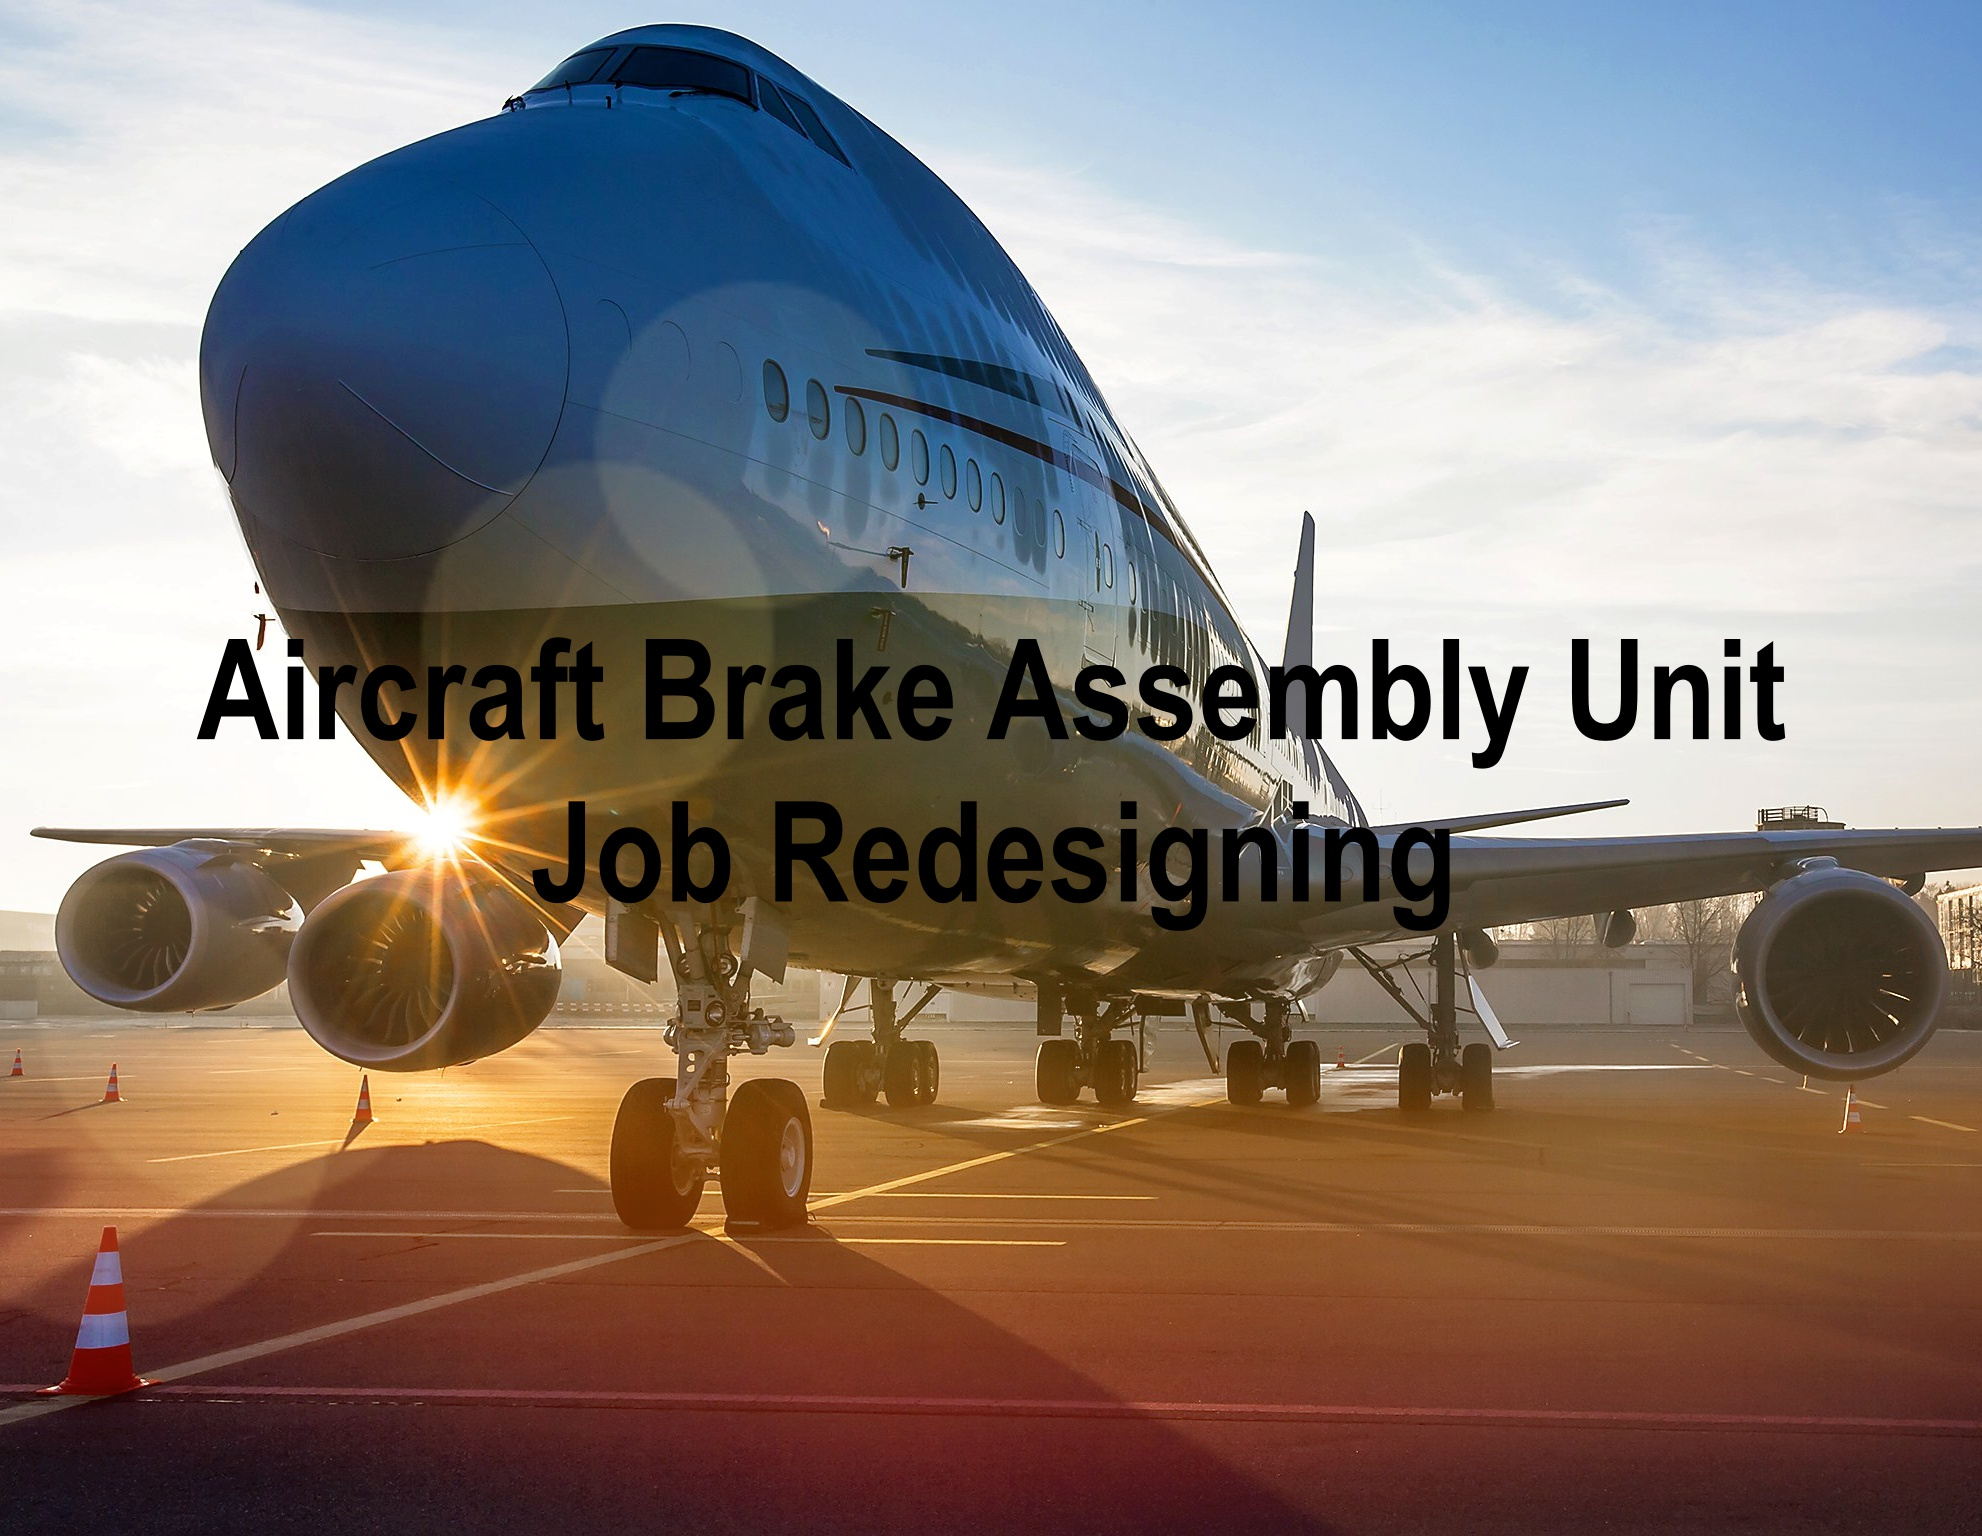 Aircraft Brake Assembly Unit Job Redesigning